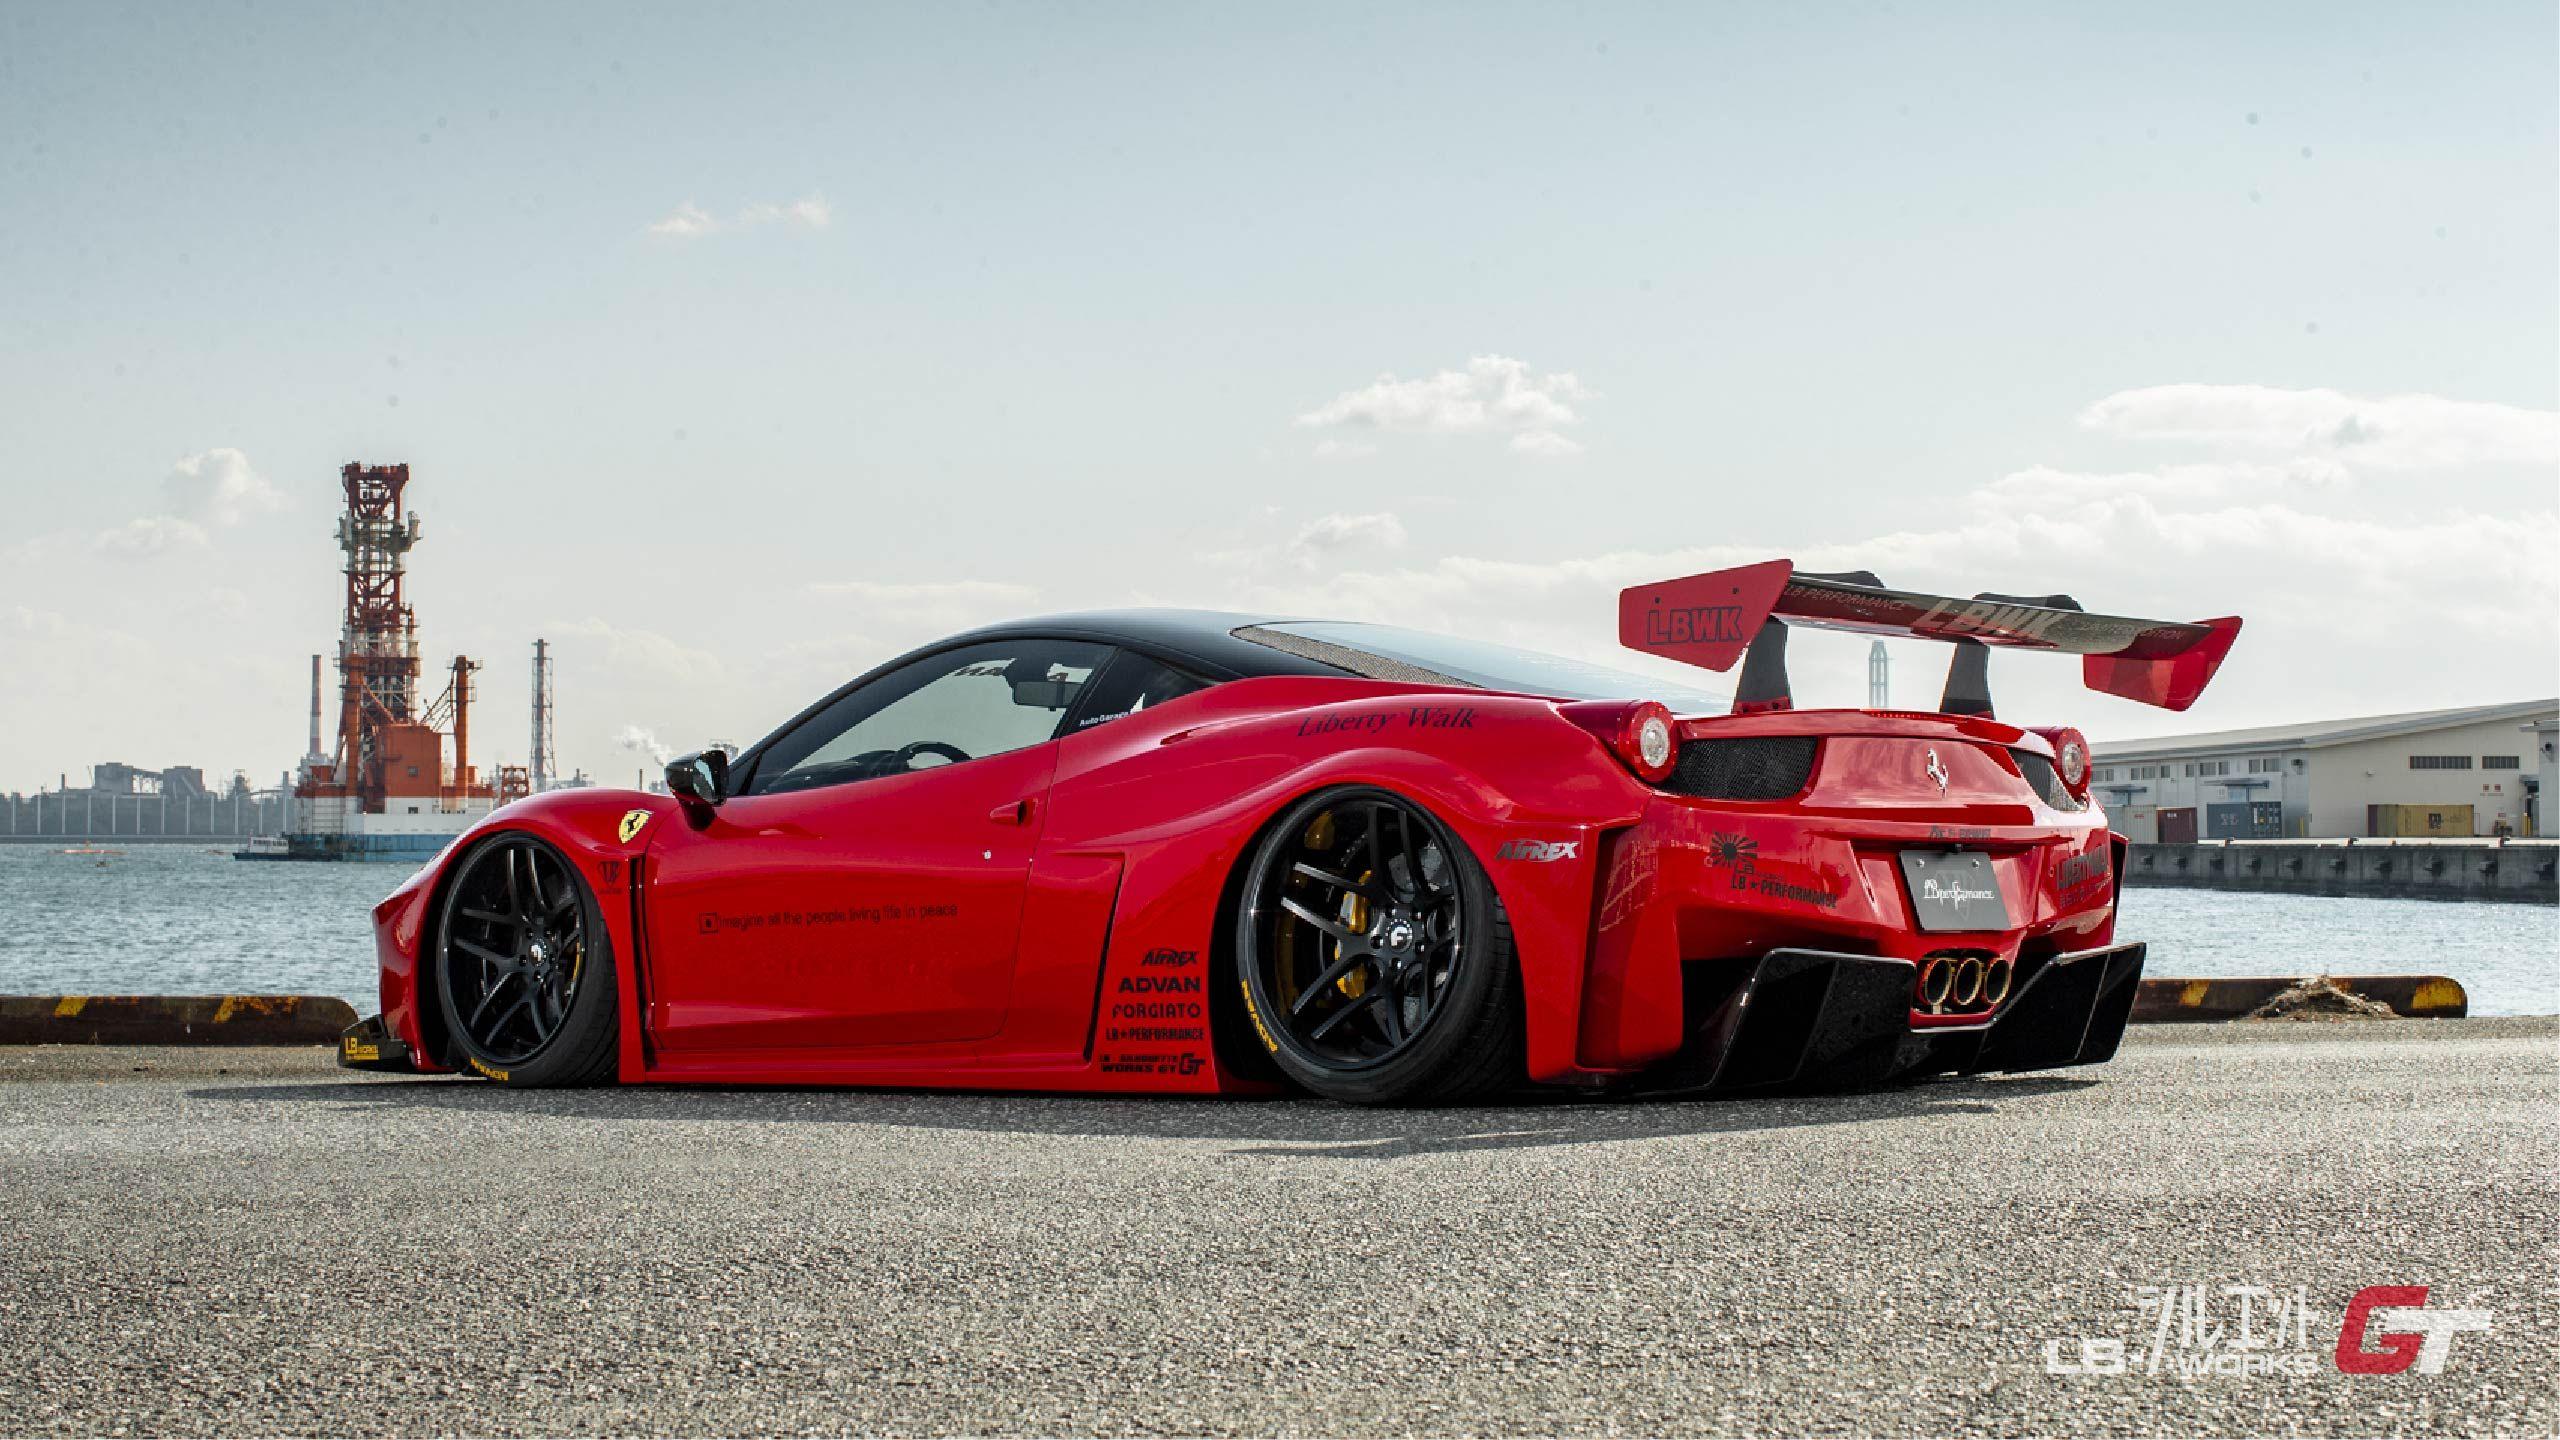 Ferrari 458 Spyder X Fi Exhaust X Liberty Walk X Pur Wheels With